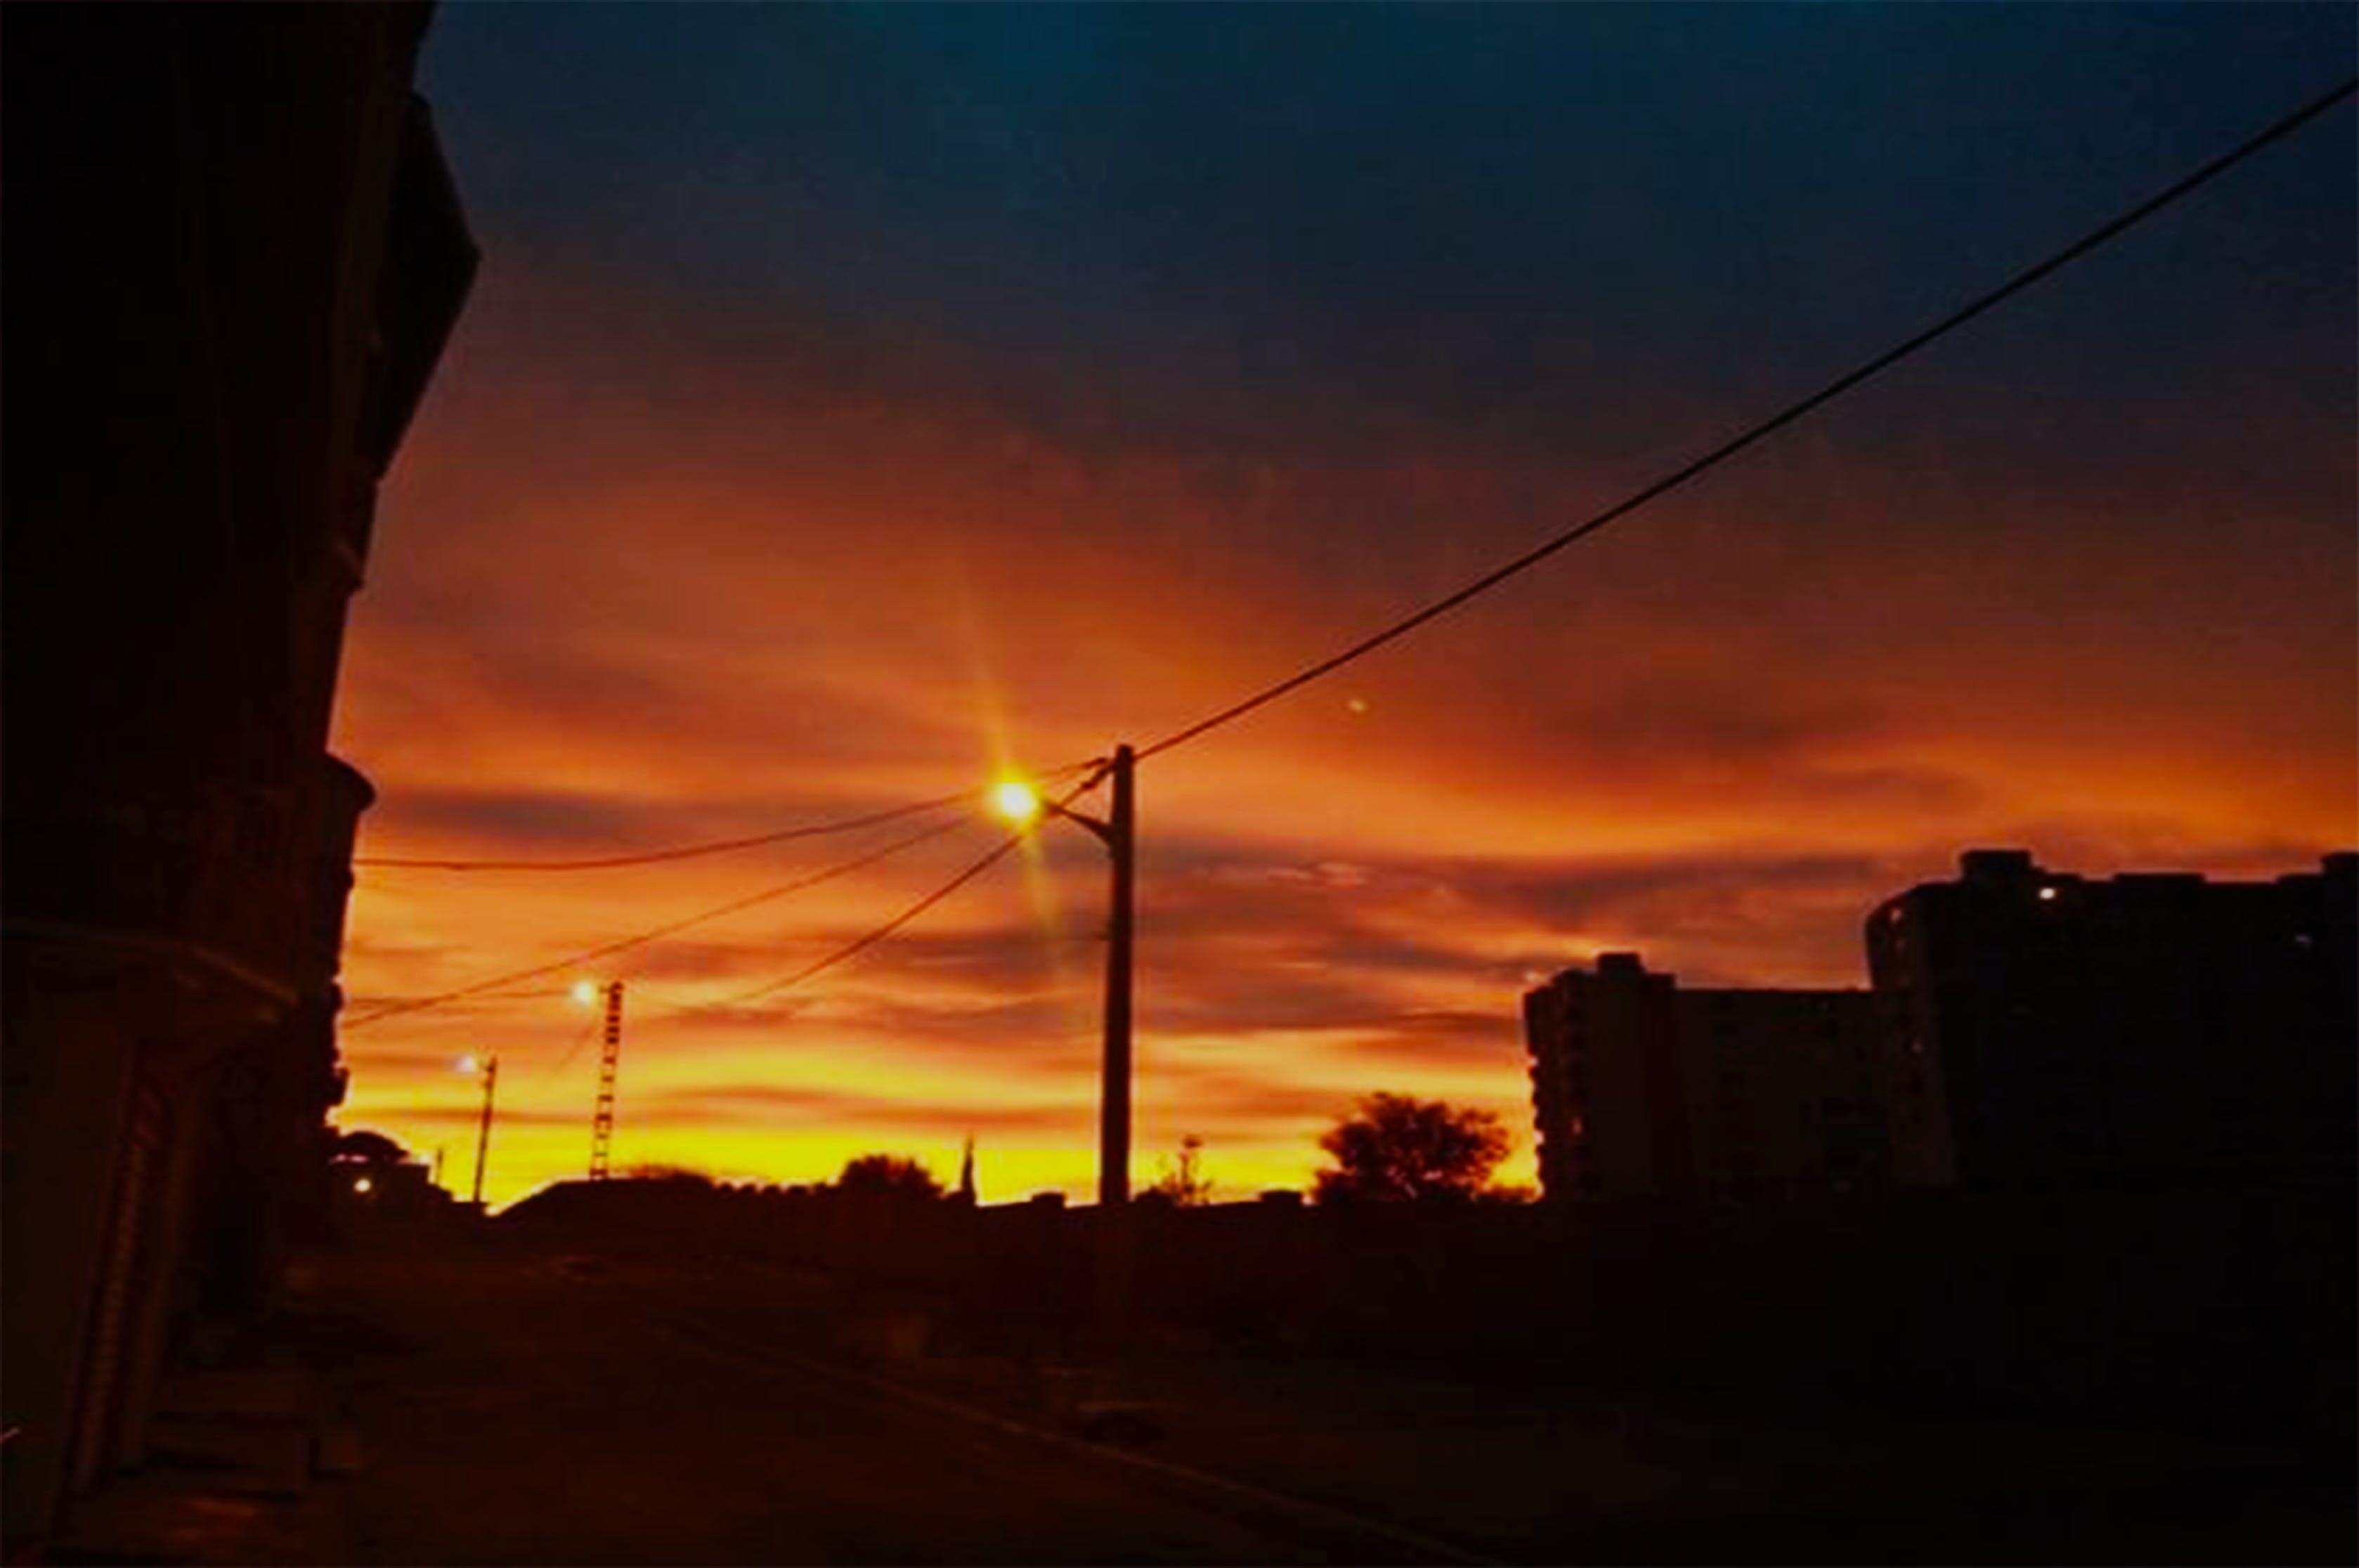 Free stock photo of before sunrise, blue sky, mooring, perfection